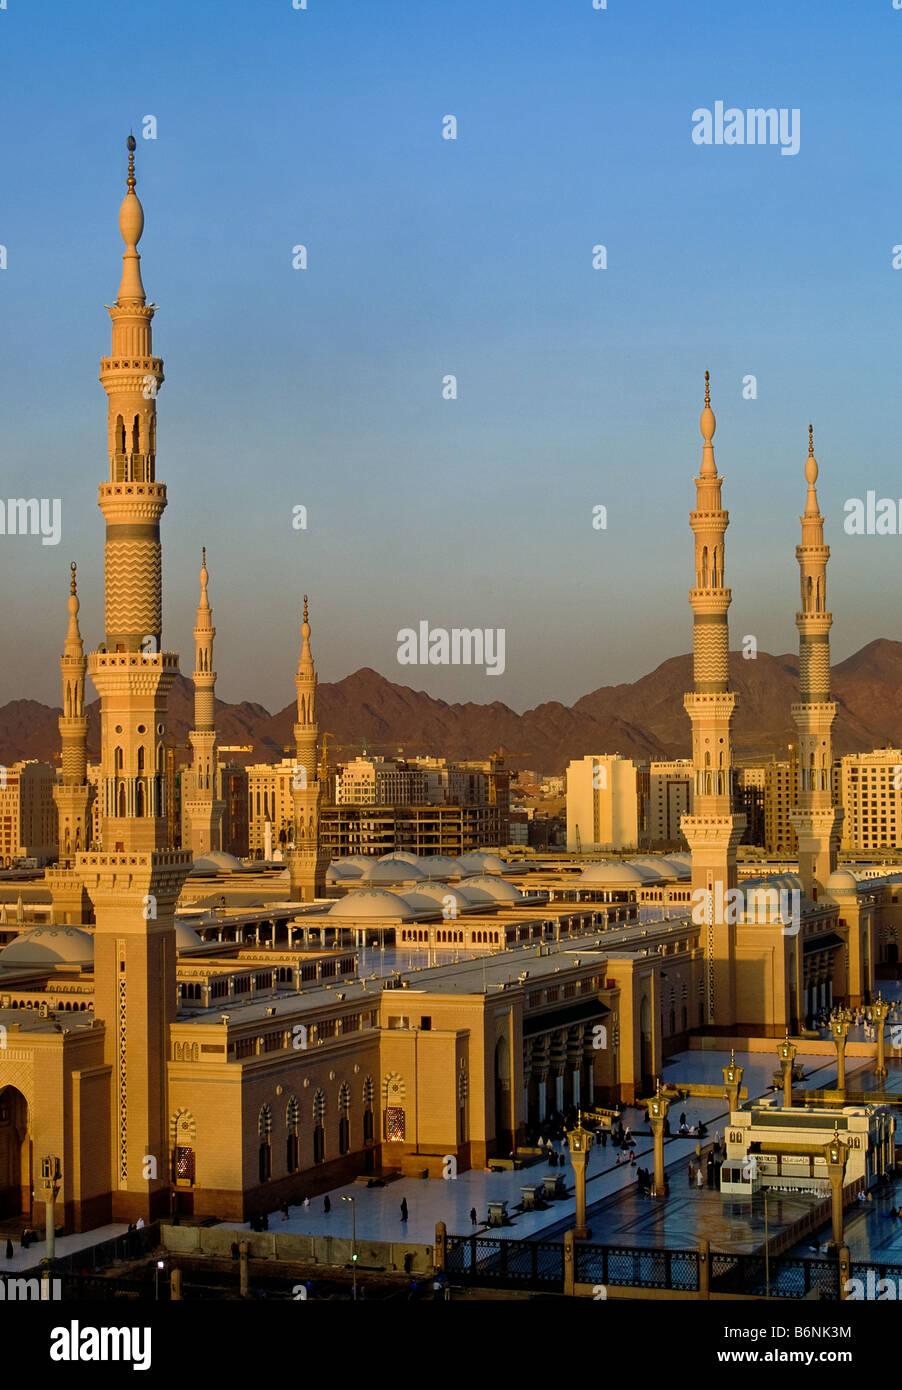 Minars (towers) of Nabawi Mosque, Madina, Saudi Arabia - Stock Image